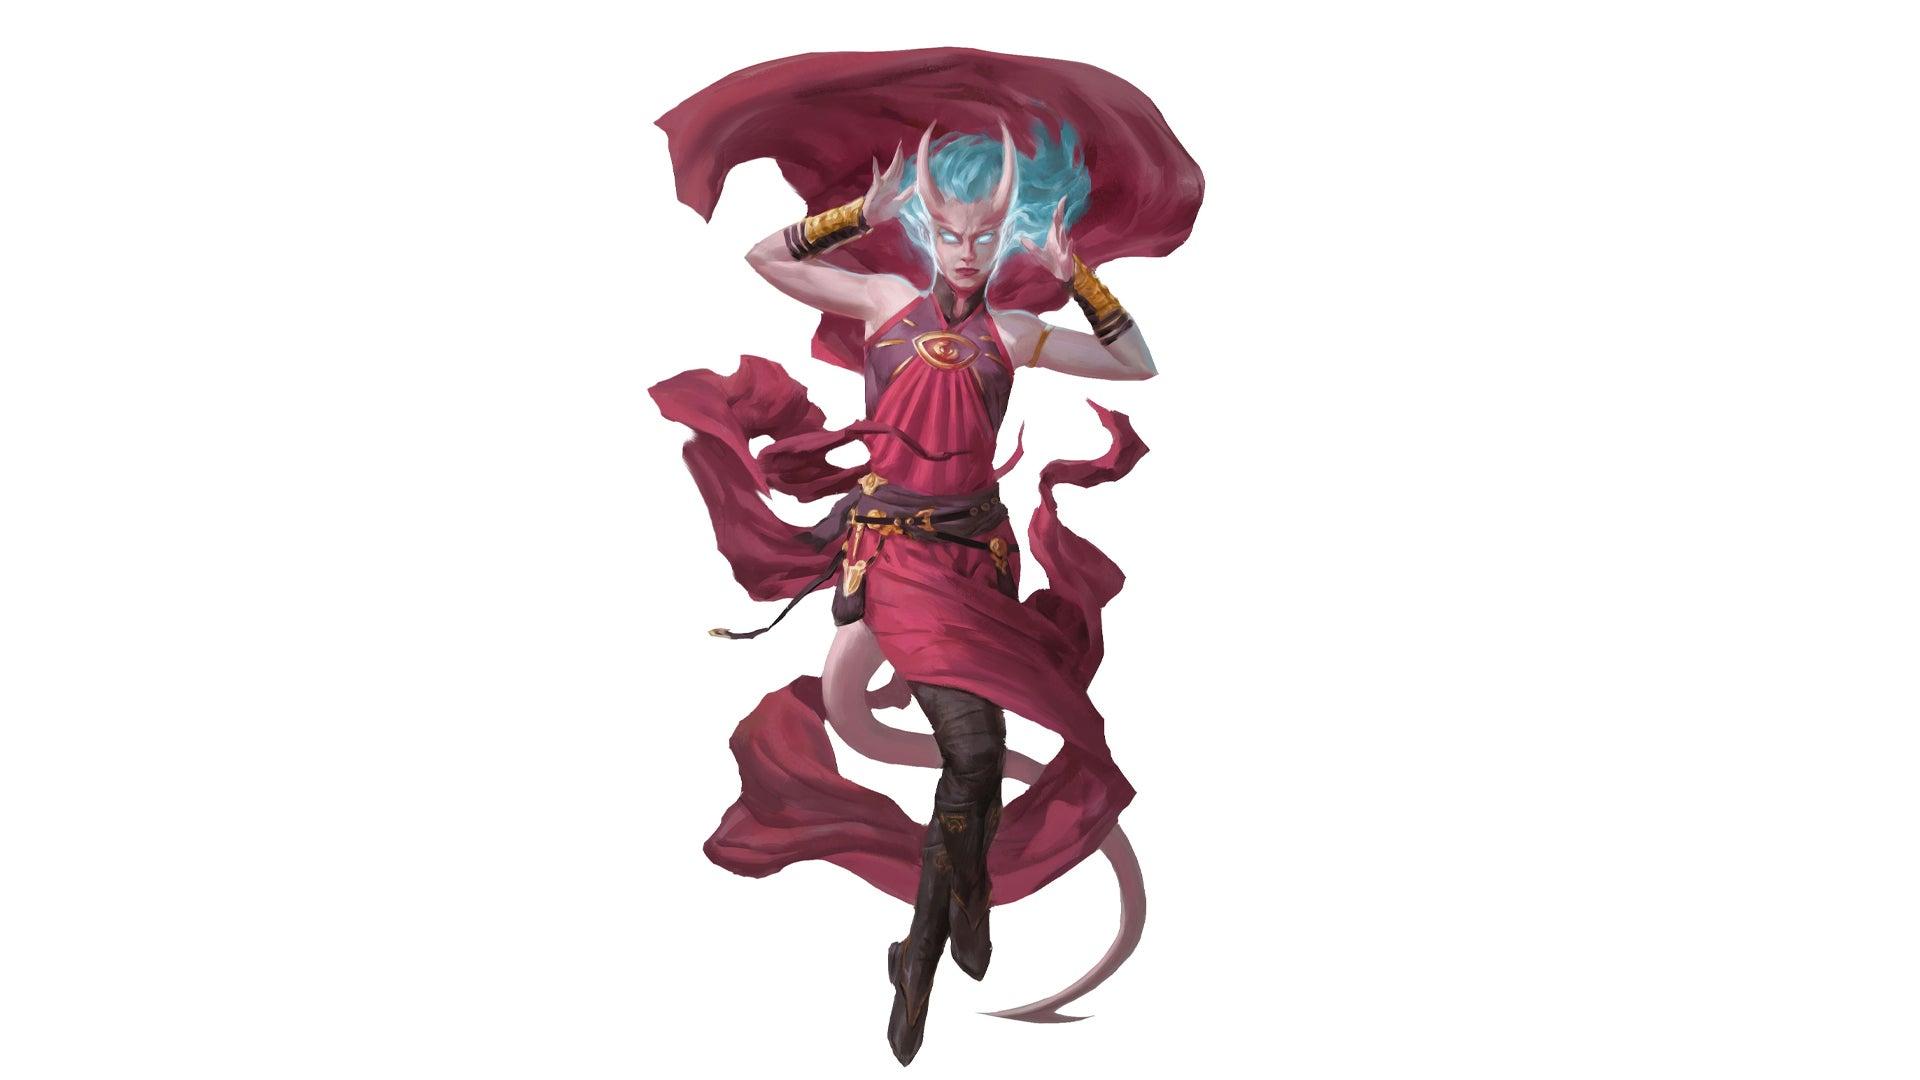 Tasha's Cauldron of Everything D&D RPG artwork 4